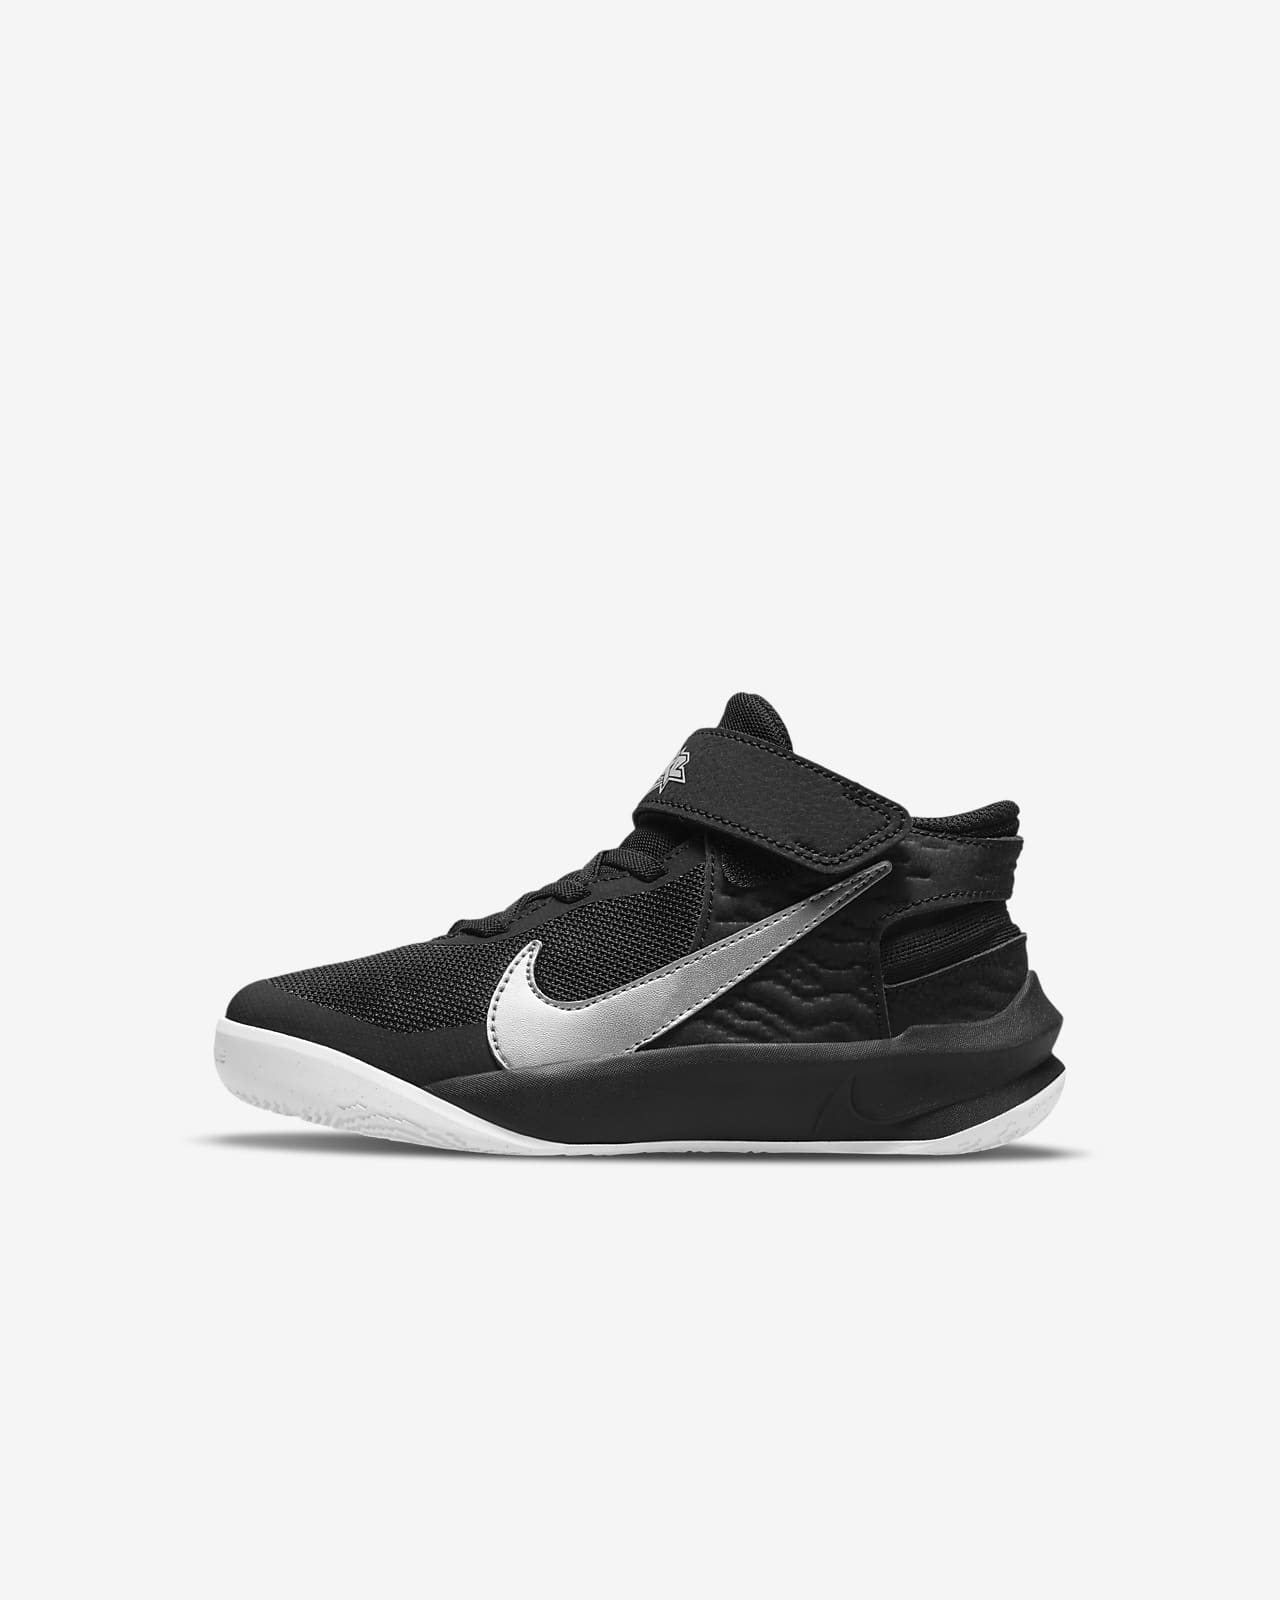 Nike Team Hustle D 10 FlyEase Schuh für jüngere Kinder